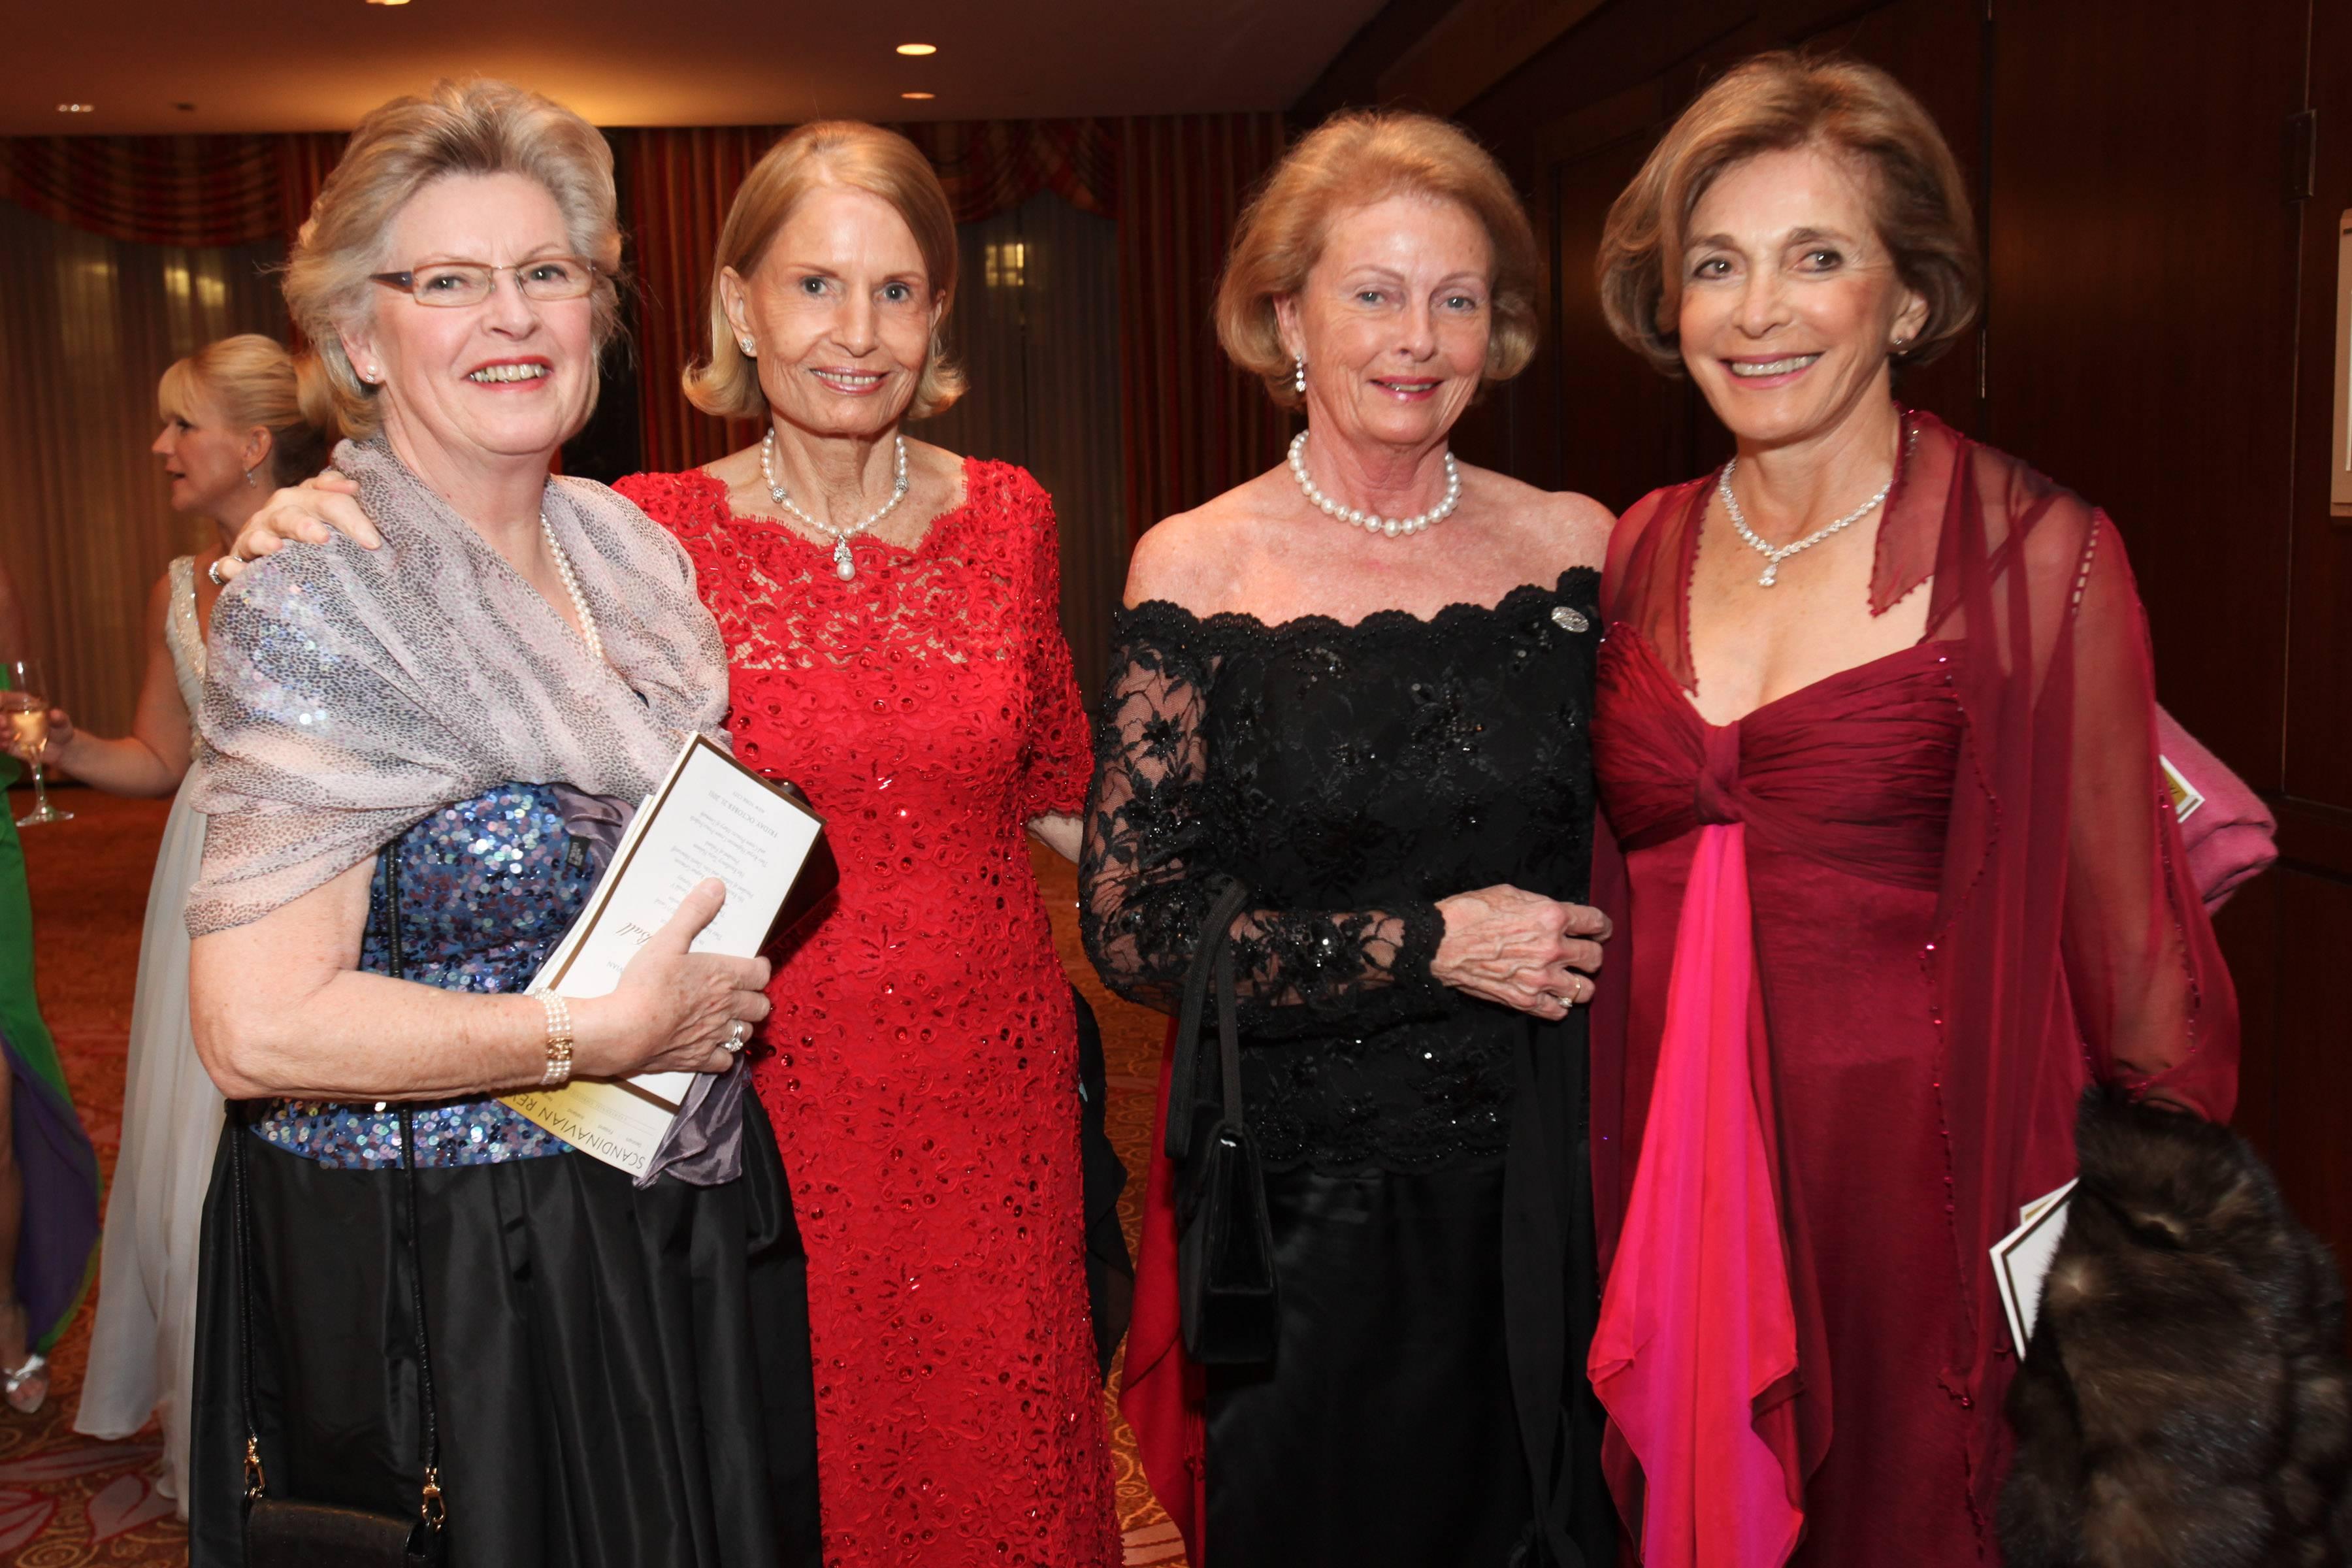 Mrs Stolt-Nielsen and friends